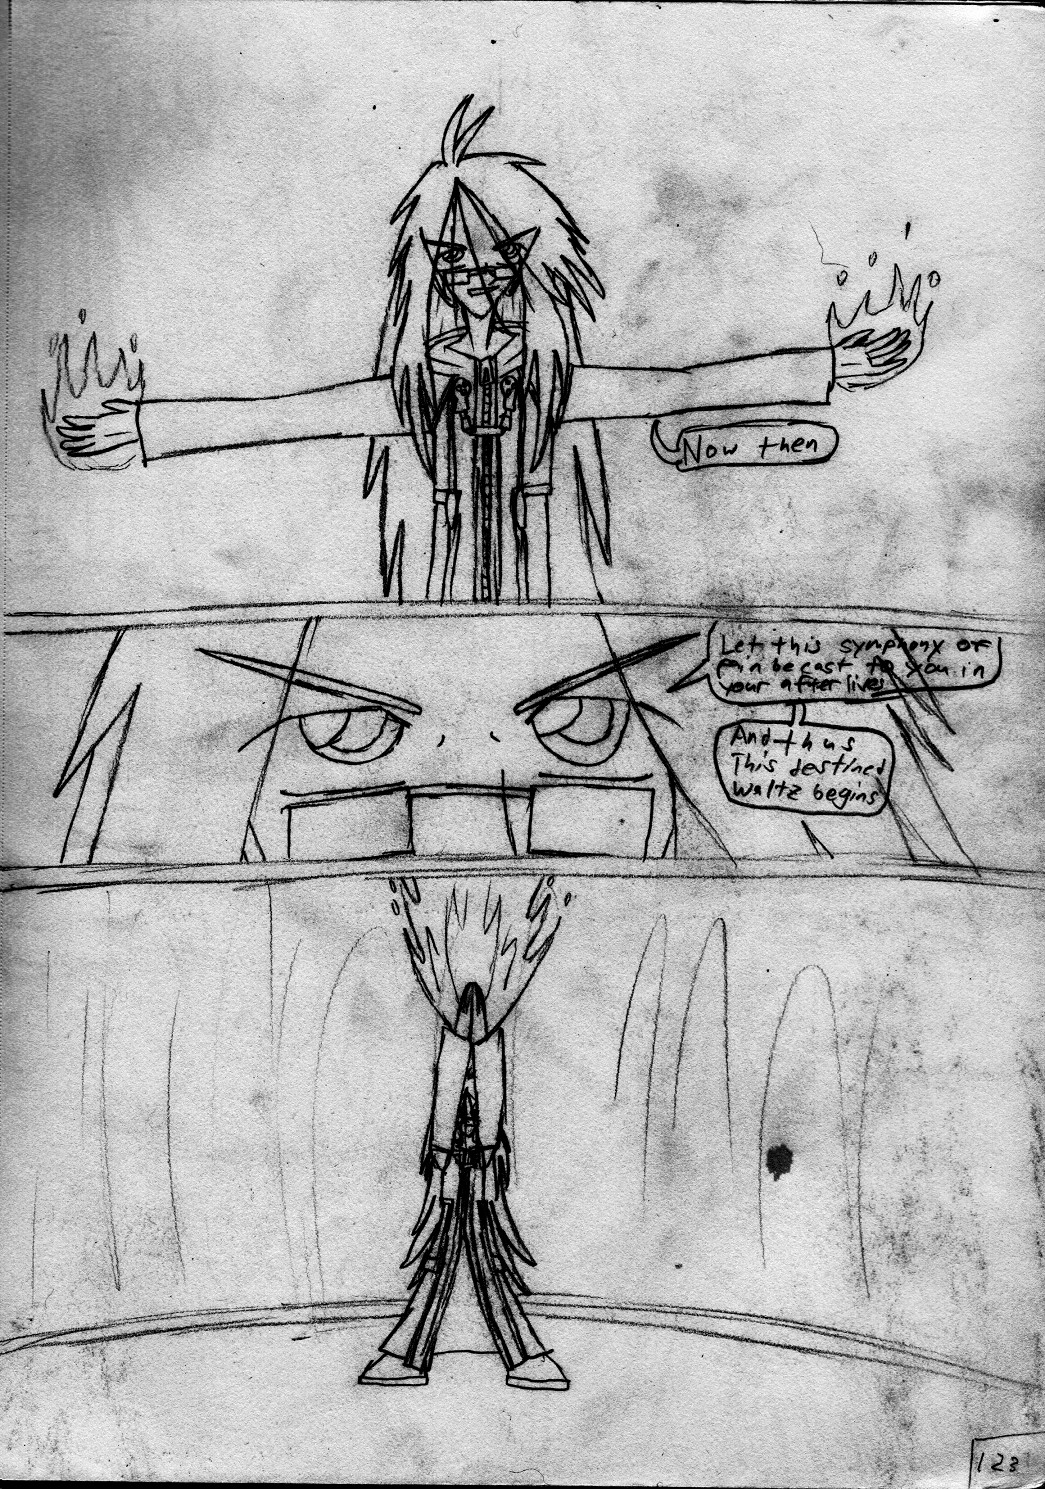 Kingdom Hearts Destined Waltz Page 123 by NIX